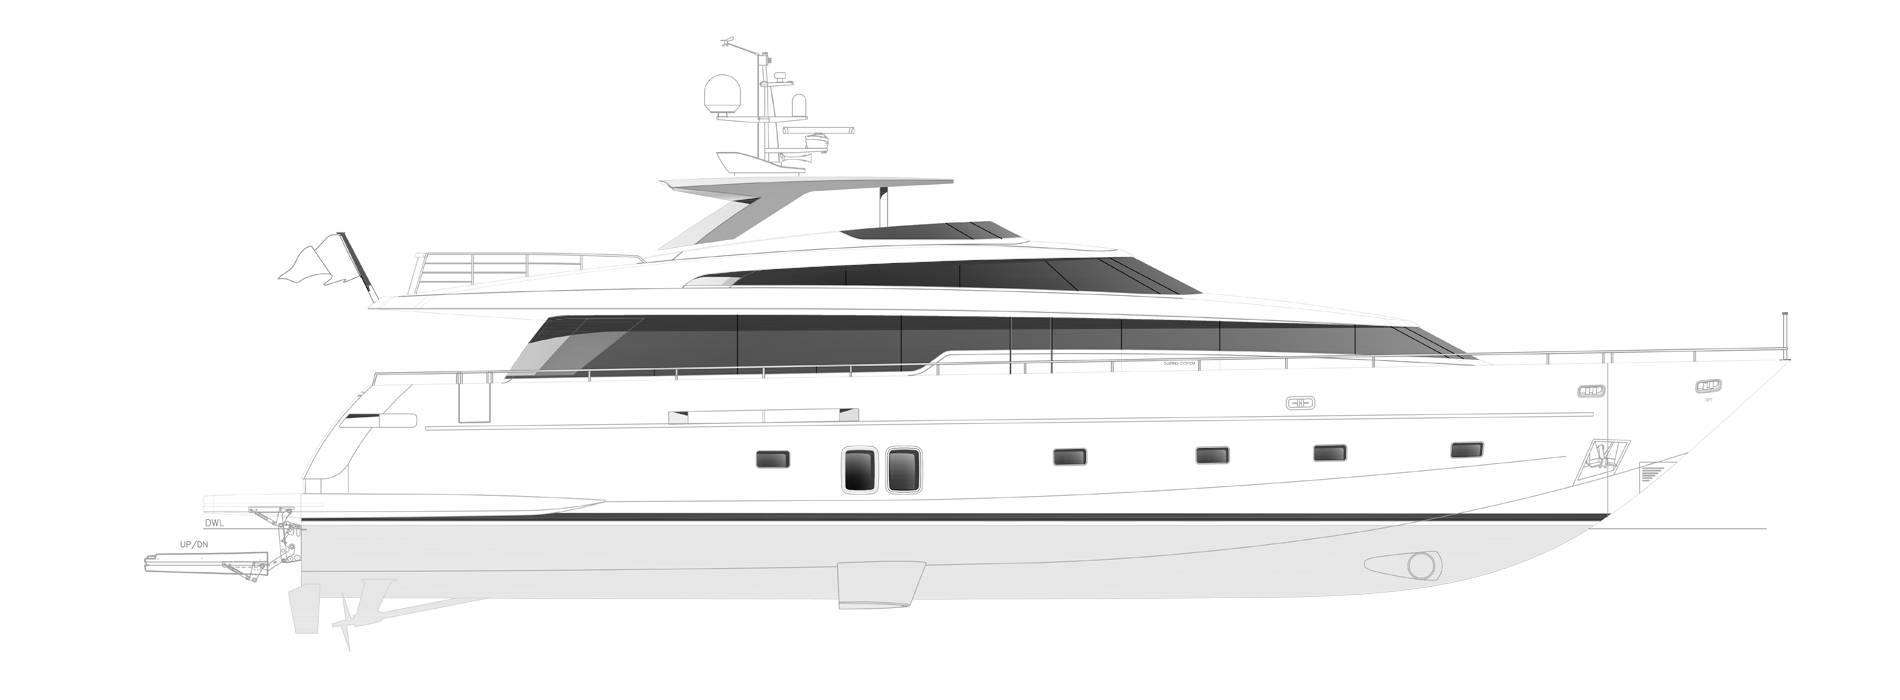 Sanlorenzo Yachts SL96-631 Профиль